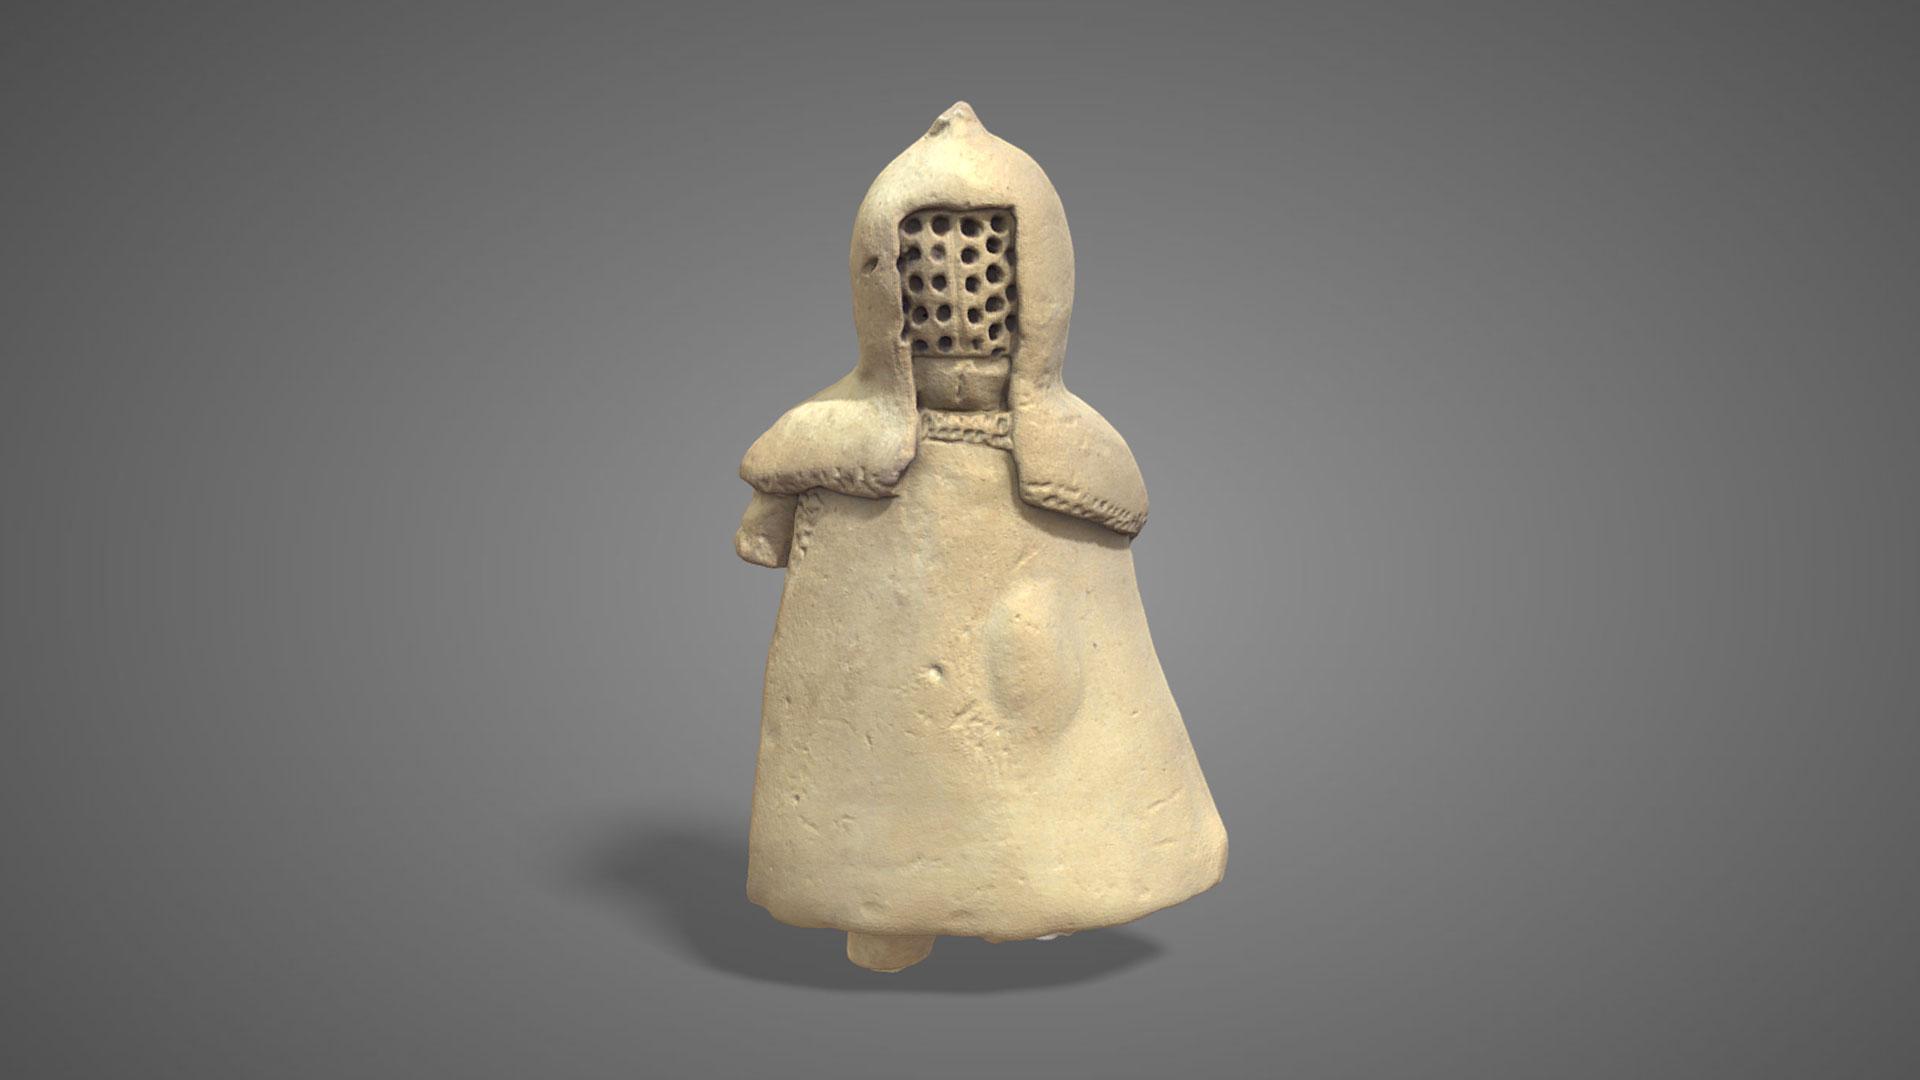 Gladiatore in terracotta | Terracotta gladiator - 3D Model